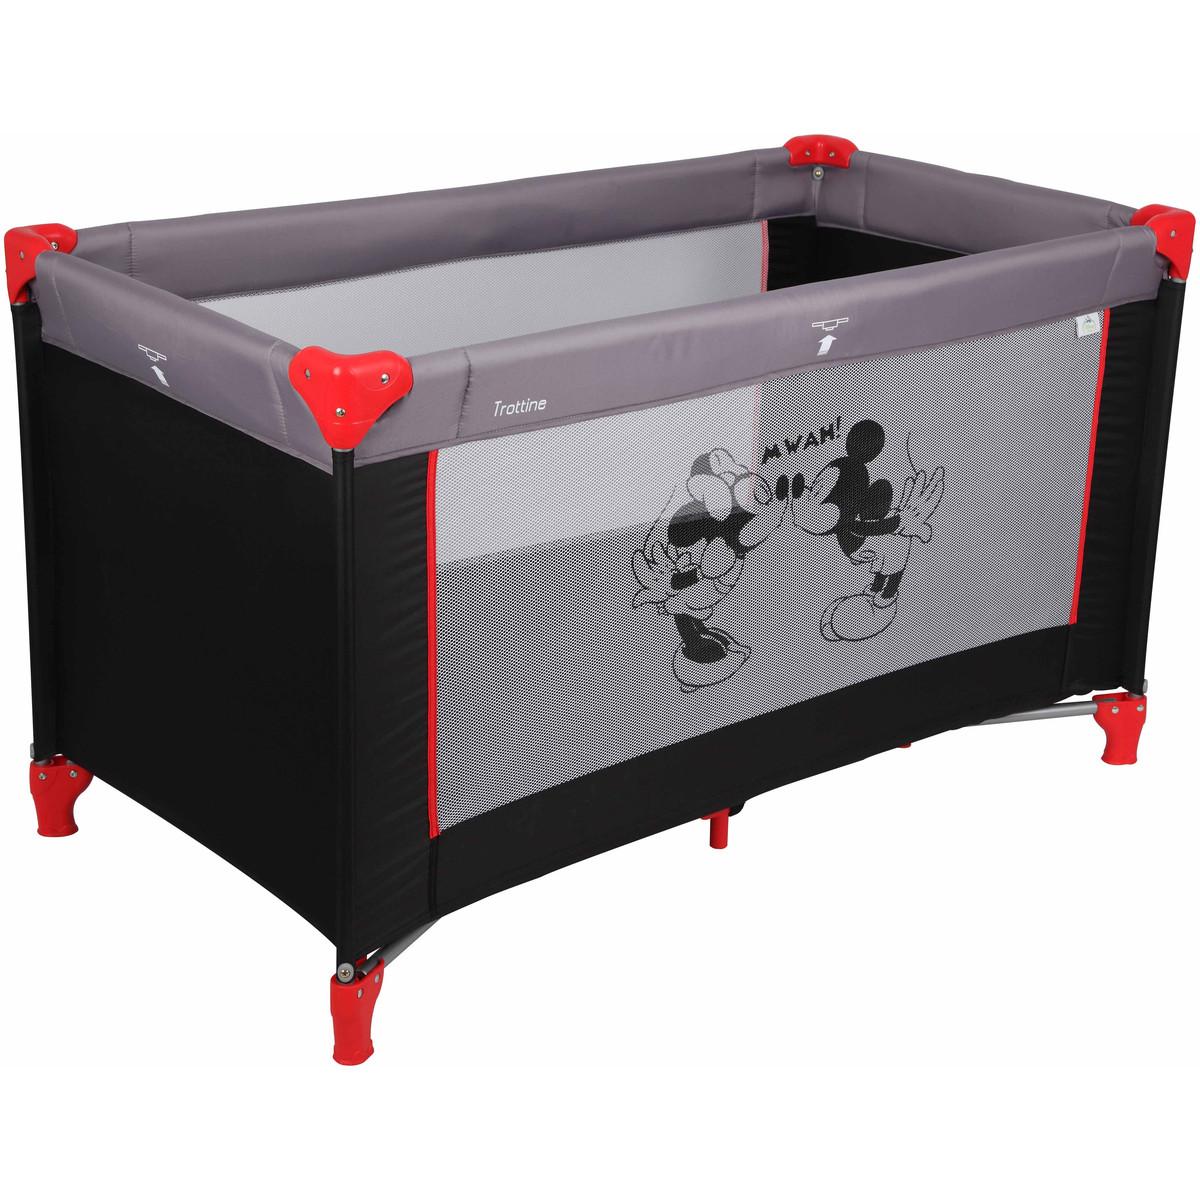 lit parapluie topiwall. Black Bedroom Furniture Sets. Home Design Ideas